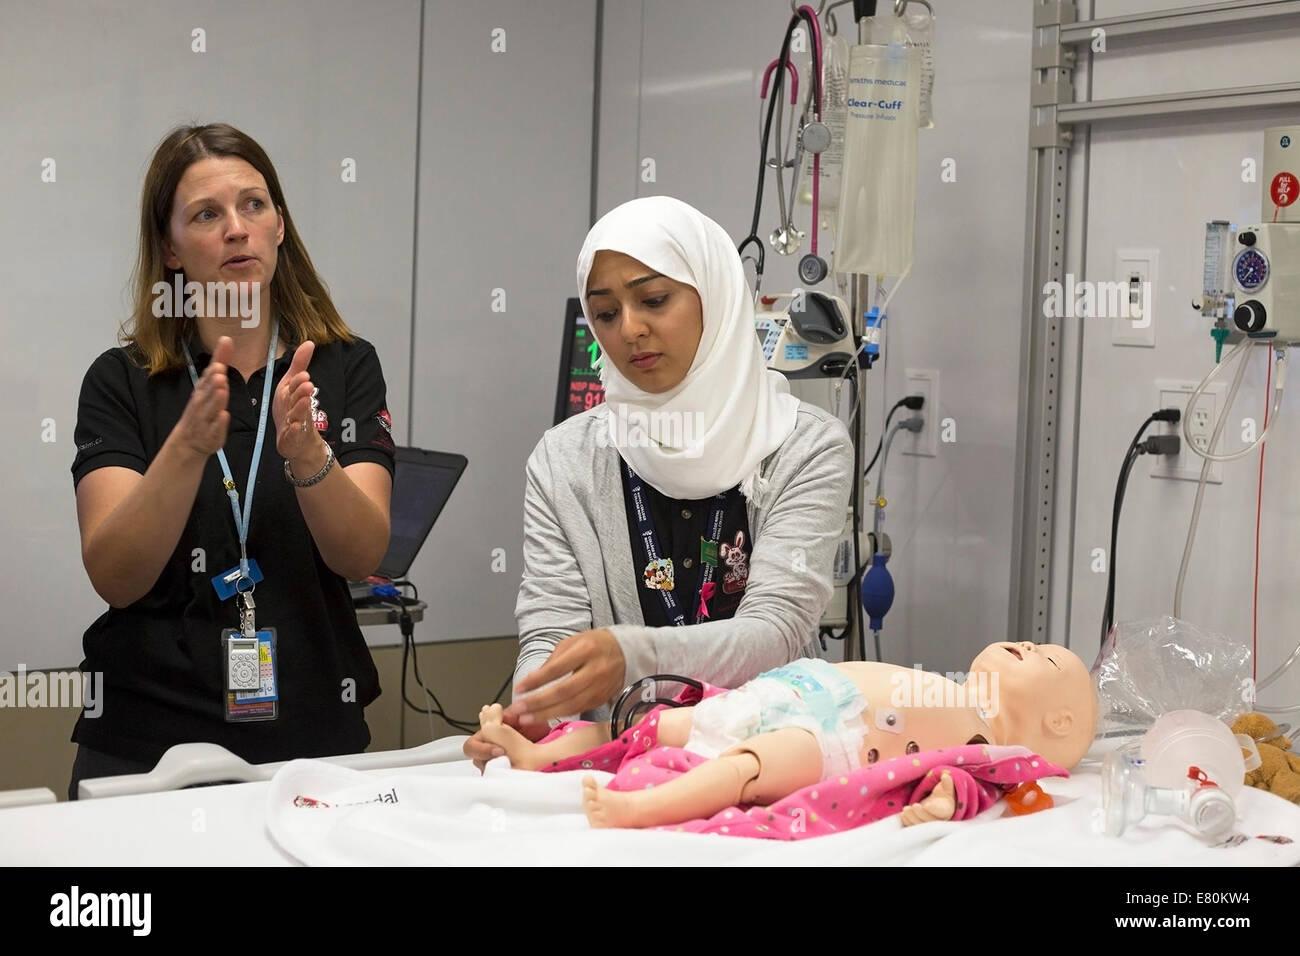 Calgary, Alberta, Canada, 27 Sep, 2014. Pediatric intensive care nurse Helen Catene (left) and pediatric doctor - Stock Image